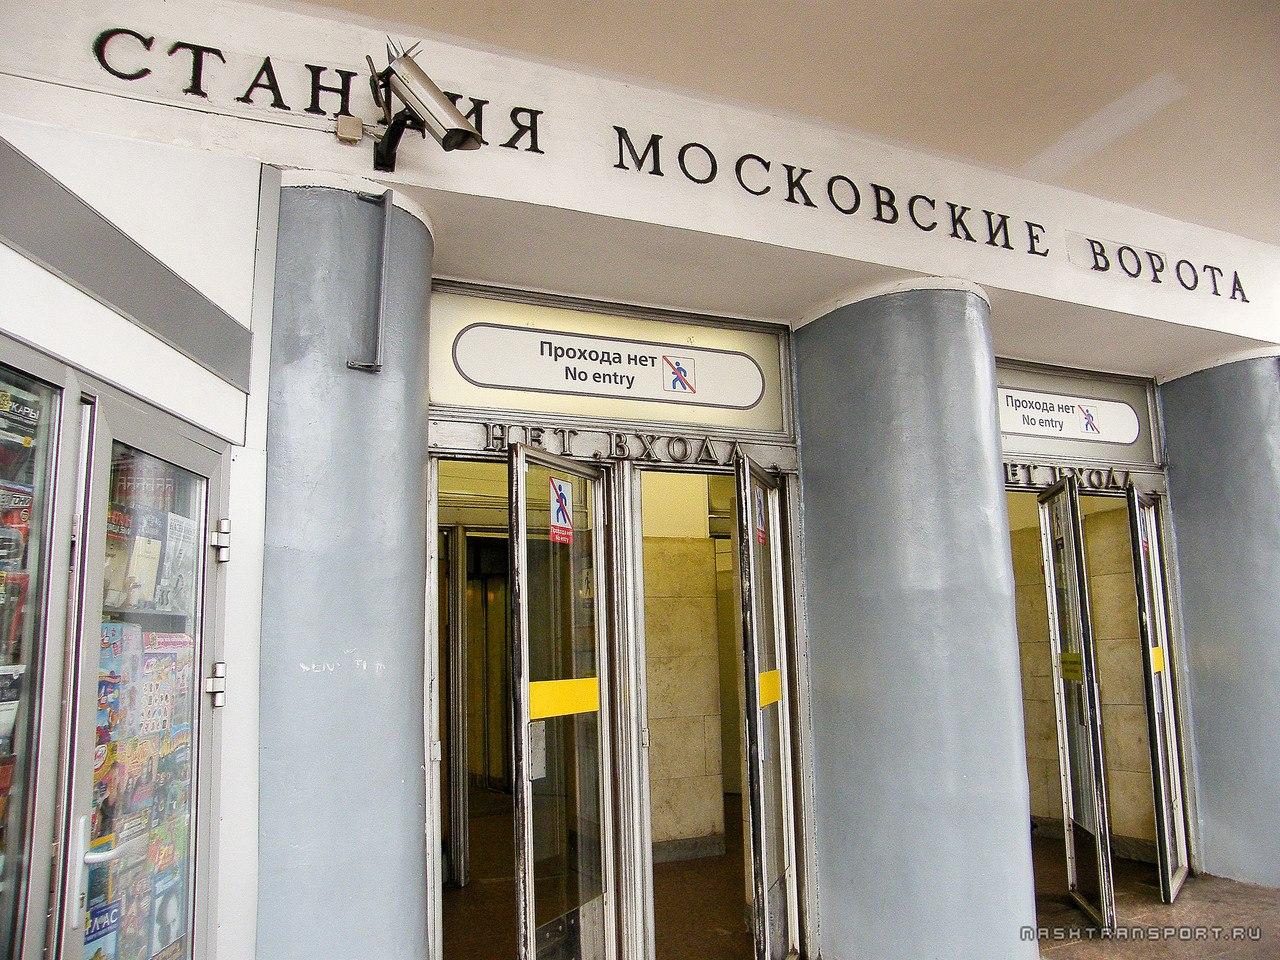 "Станция метро ""Московские ворота"". Фото: vk.com/metro_moskovskie_vorota"